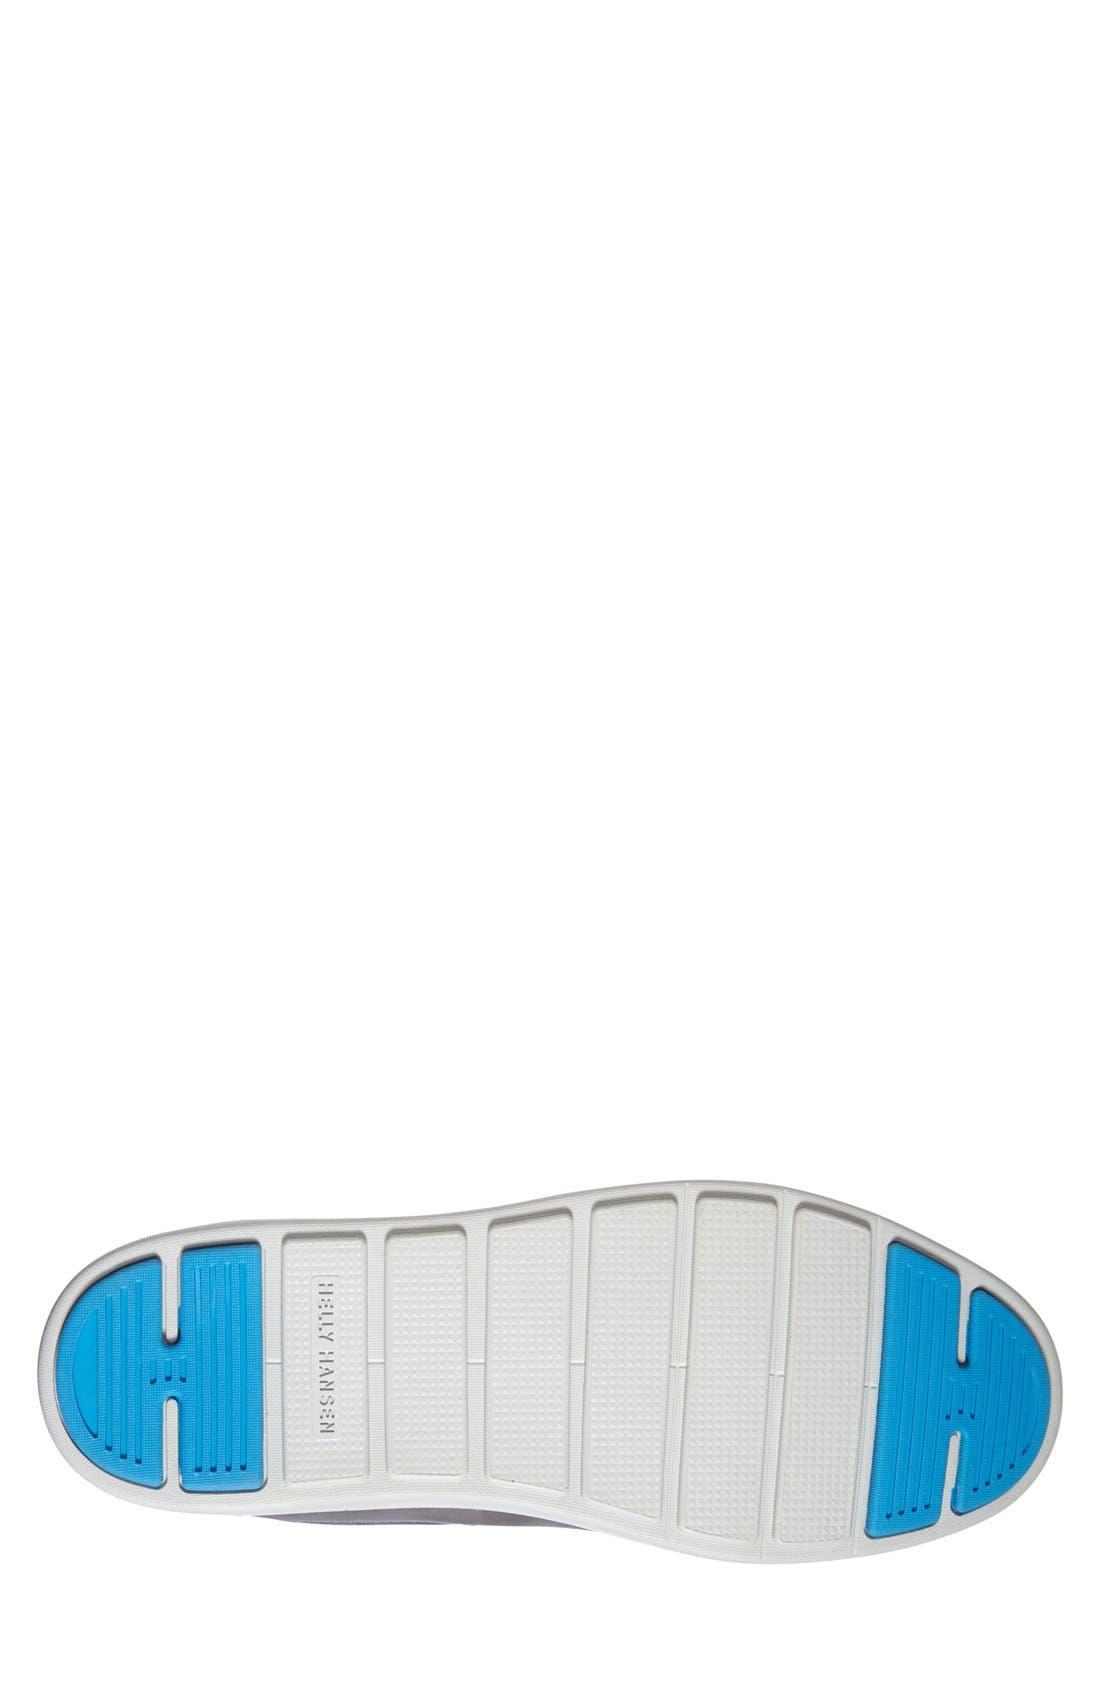 'Stockholm' Waterproof High Top Sneaker,                             Alternate thumbnail 11, color,